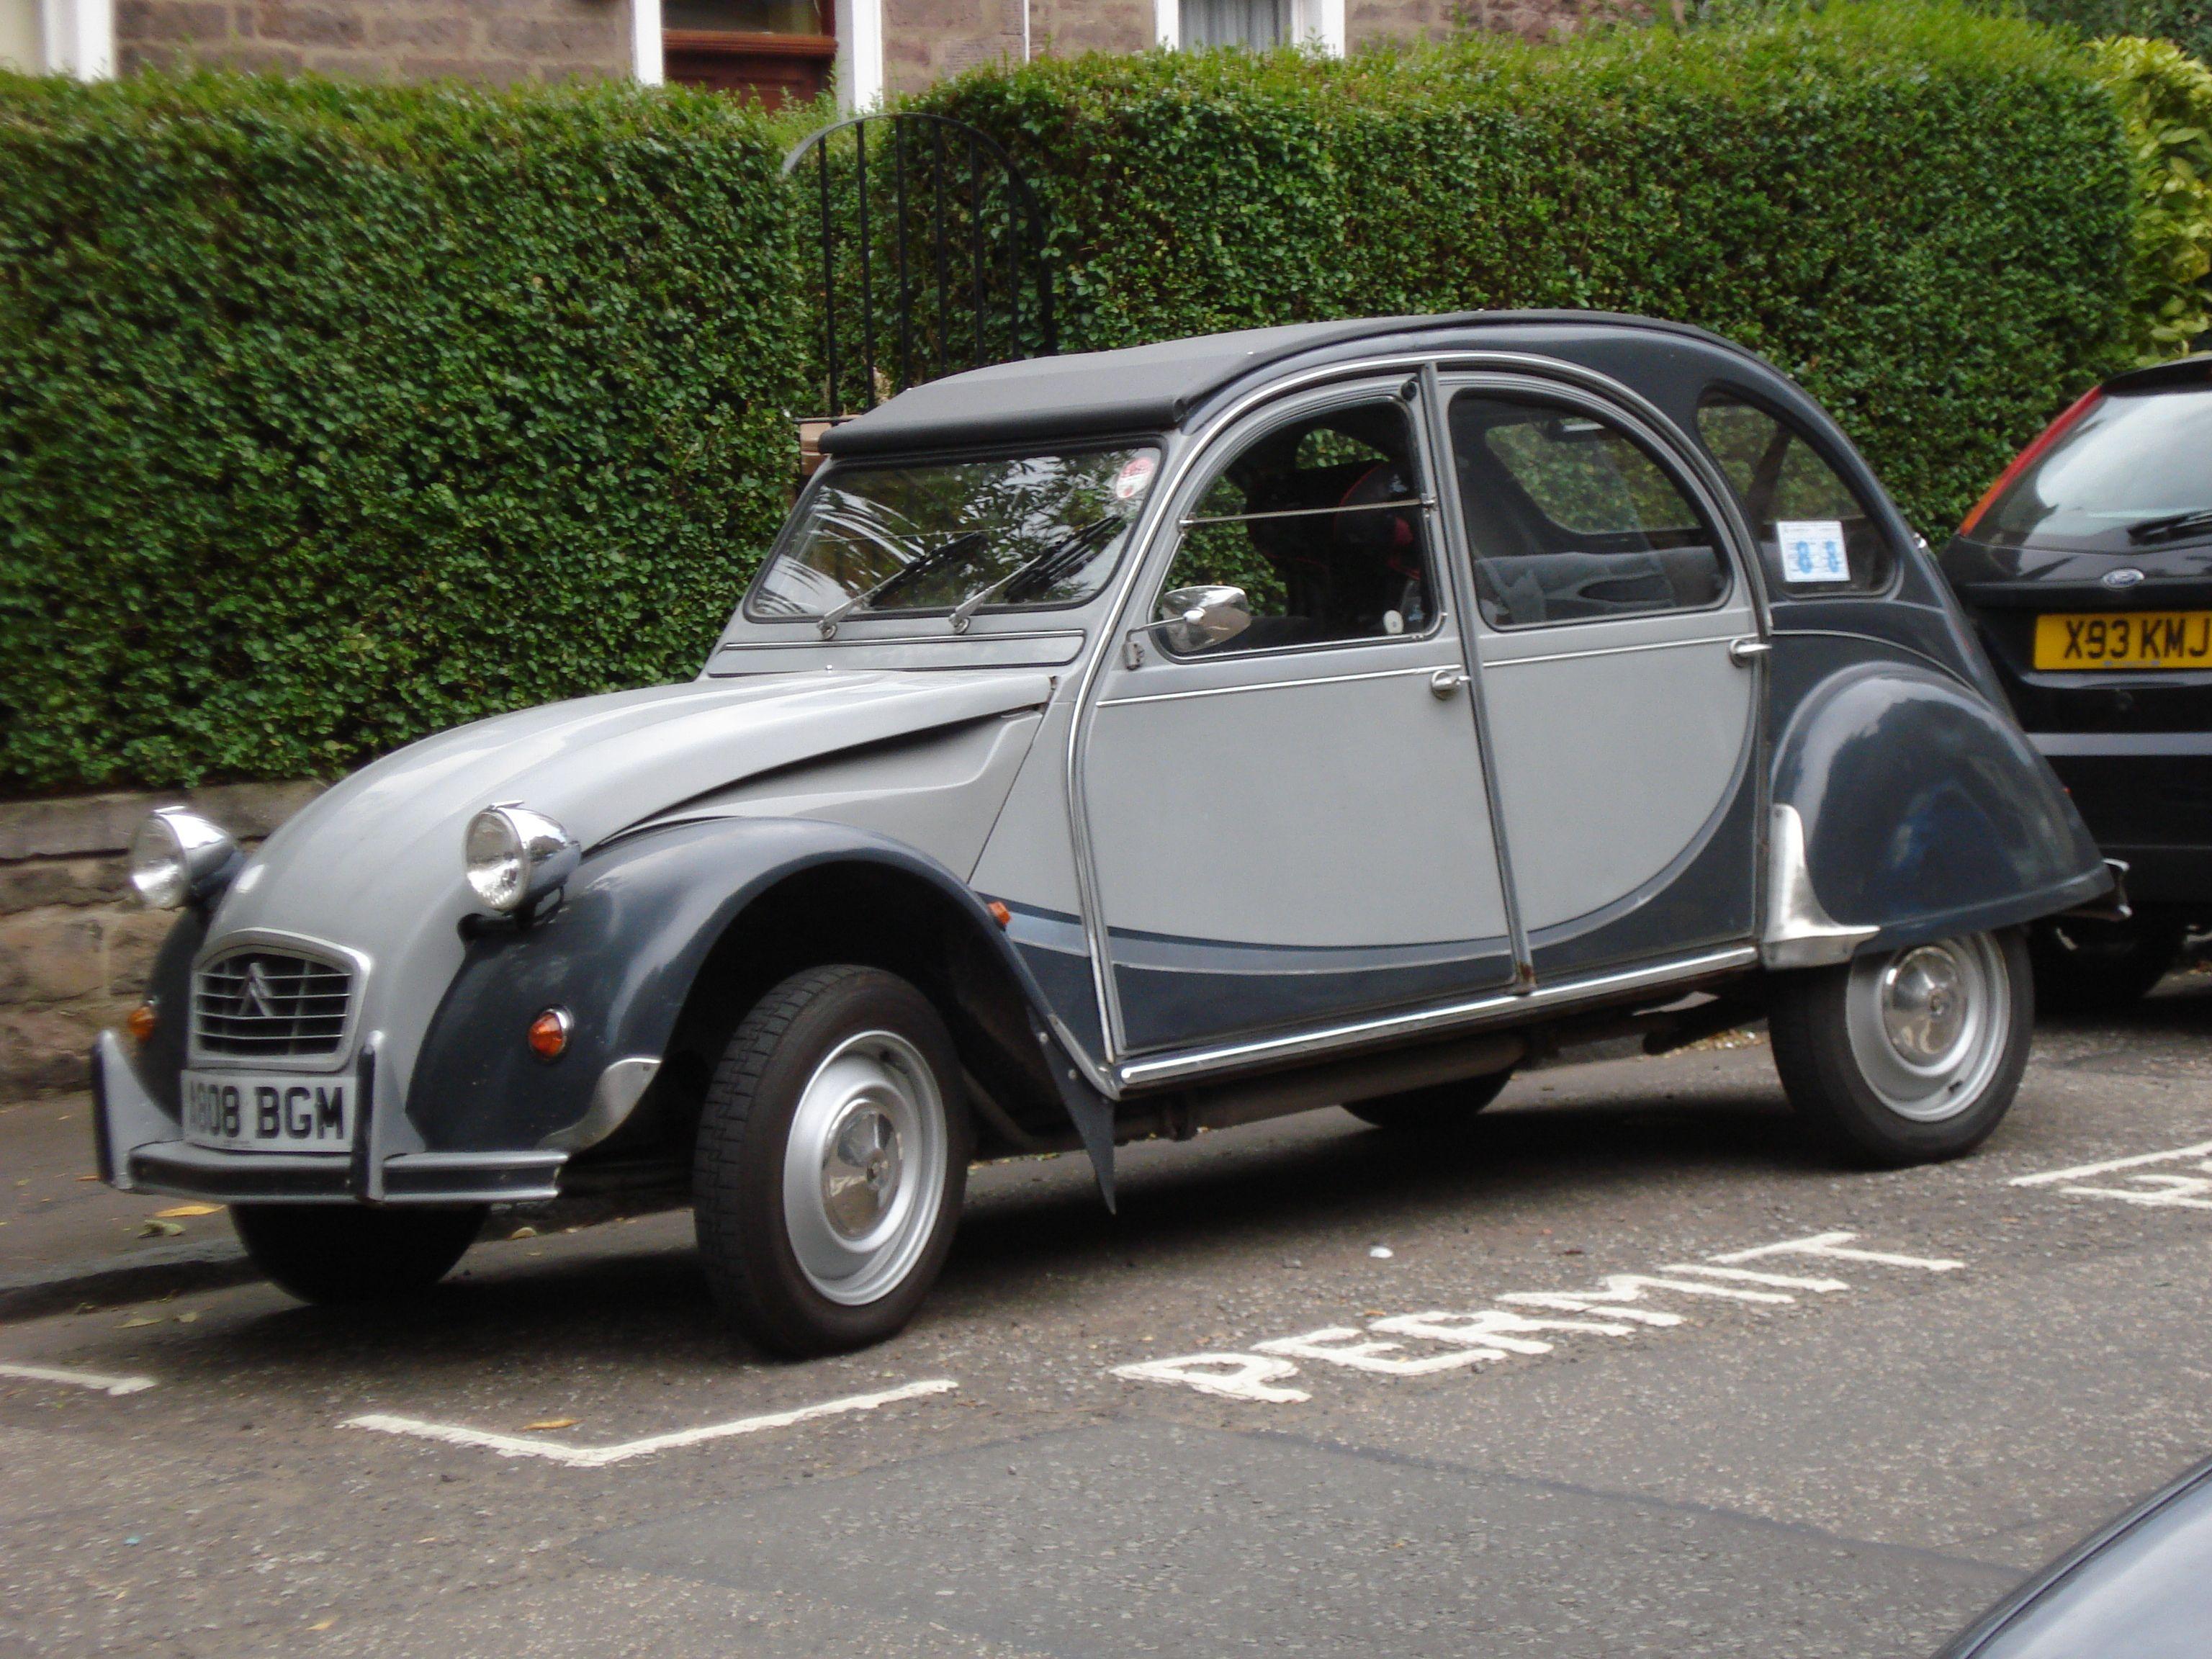 citroen 2 cv charleston grey scheme 2cv pinterest cars. Black Bedroom Furniture Sets. Home Design Ideas